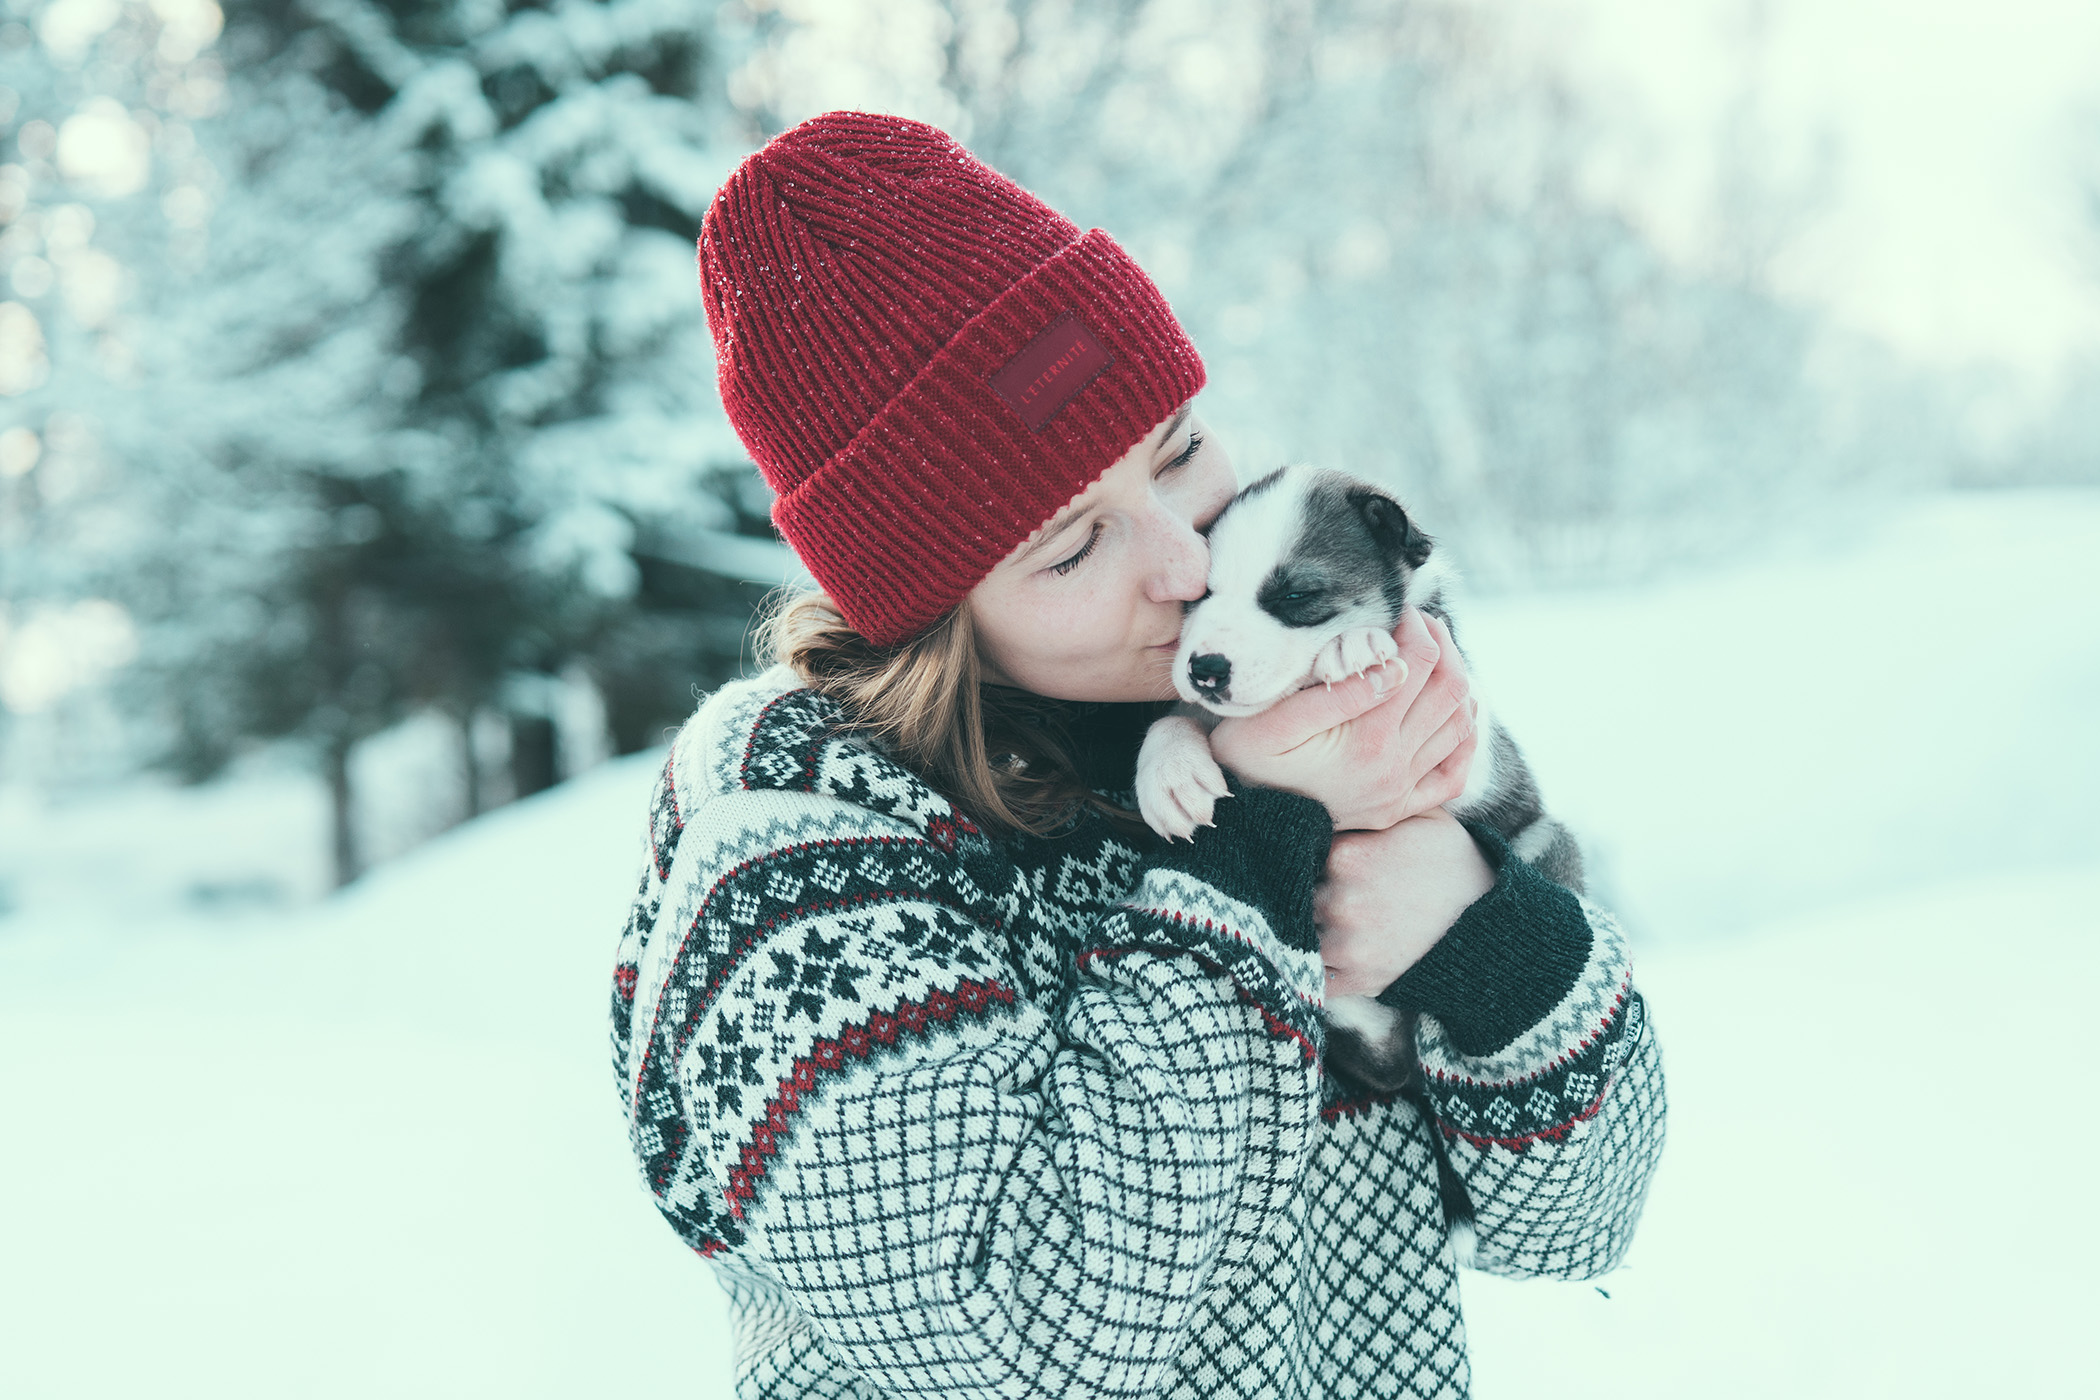 Paulina kissing puppy Yukon